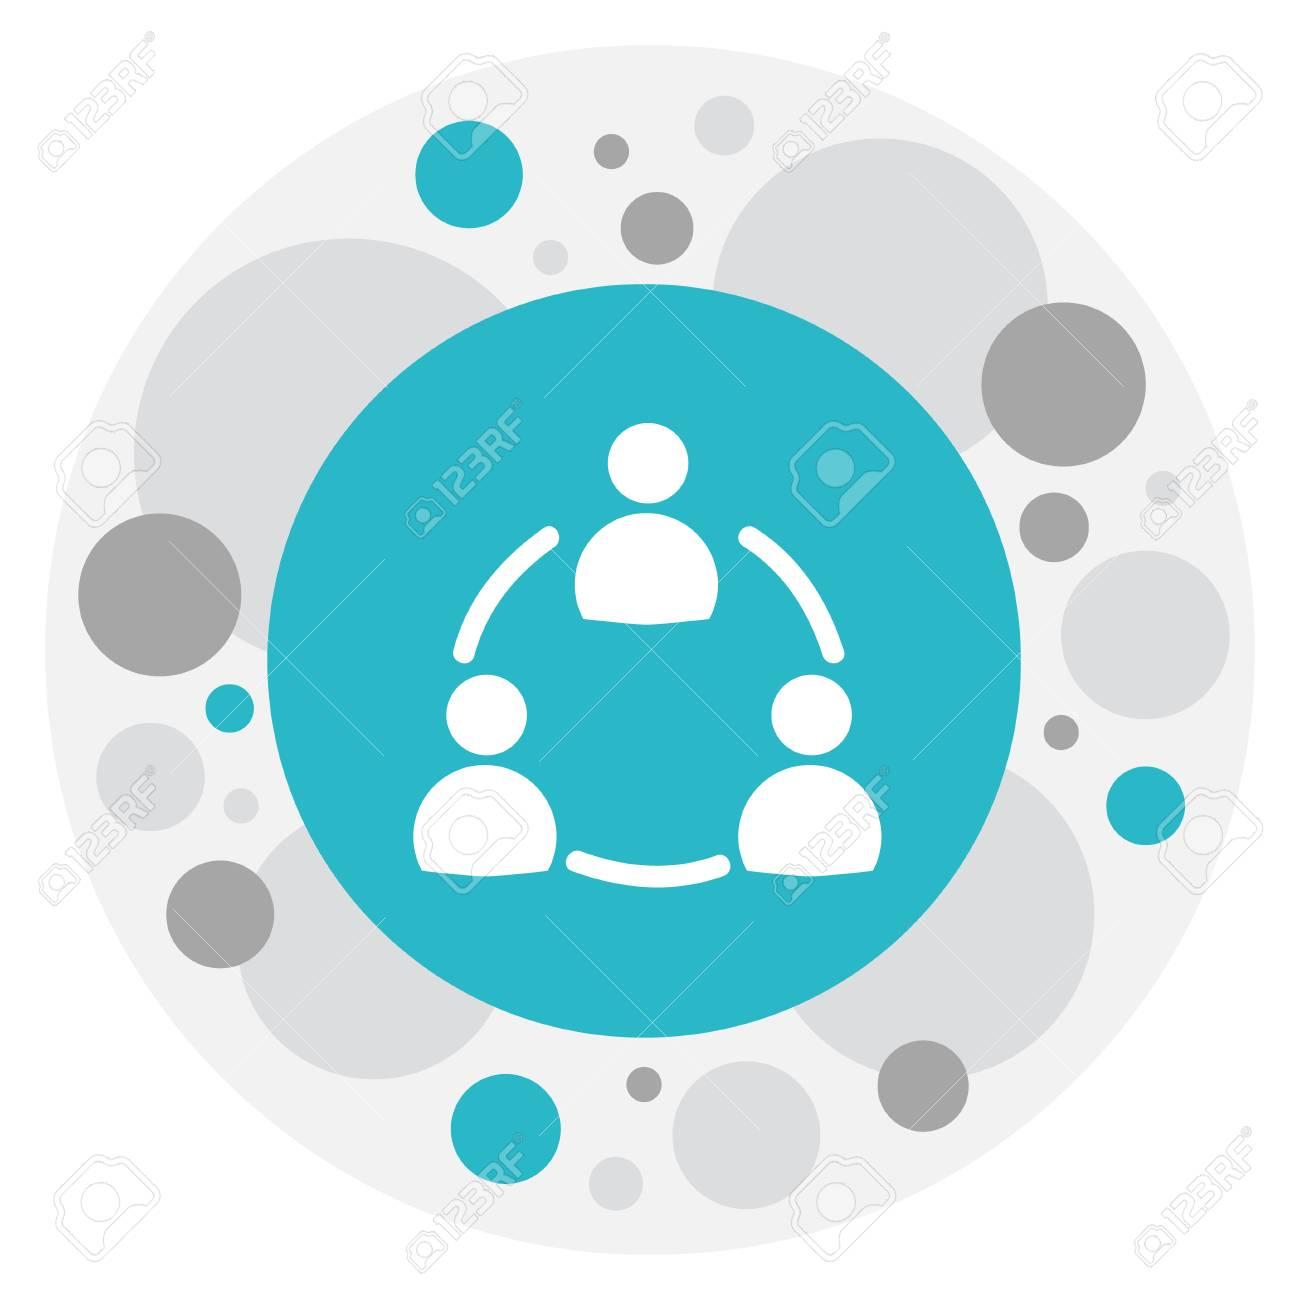 Illustration Of Unity Symbol On Staff Structure Icon. - 88787116